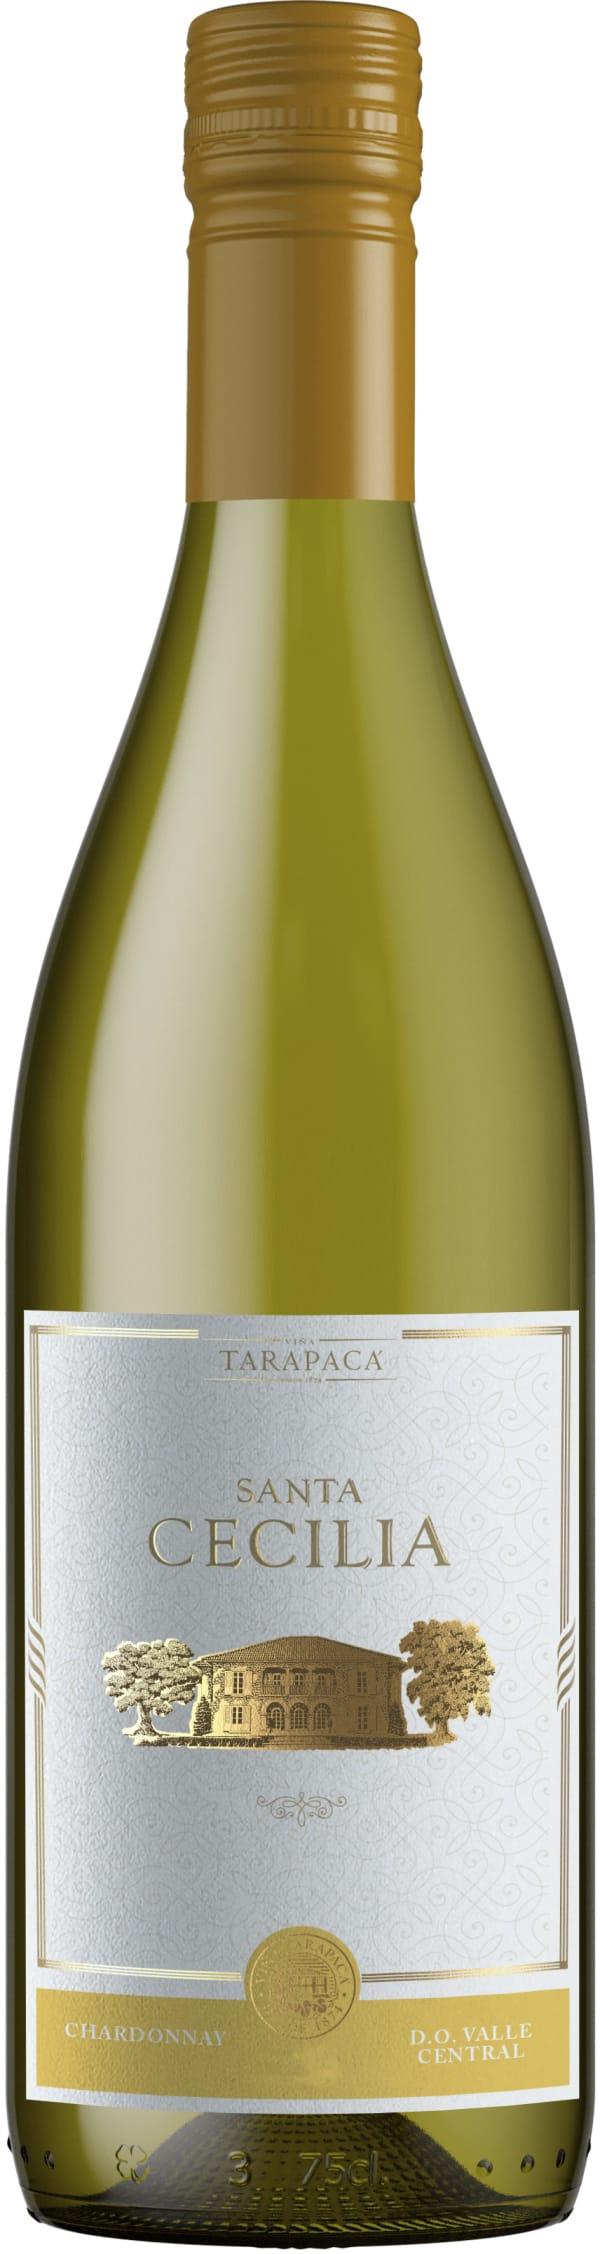 Tarapacá Santa Cecilia Chardonnay 2018